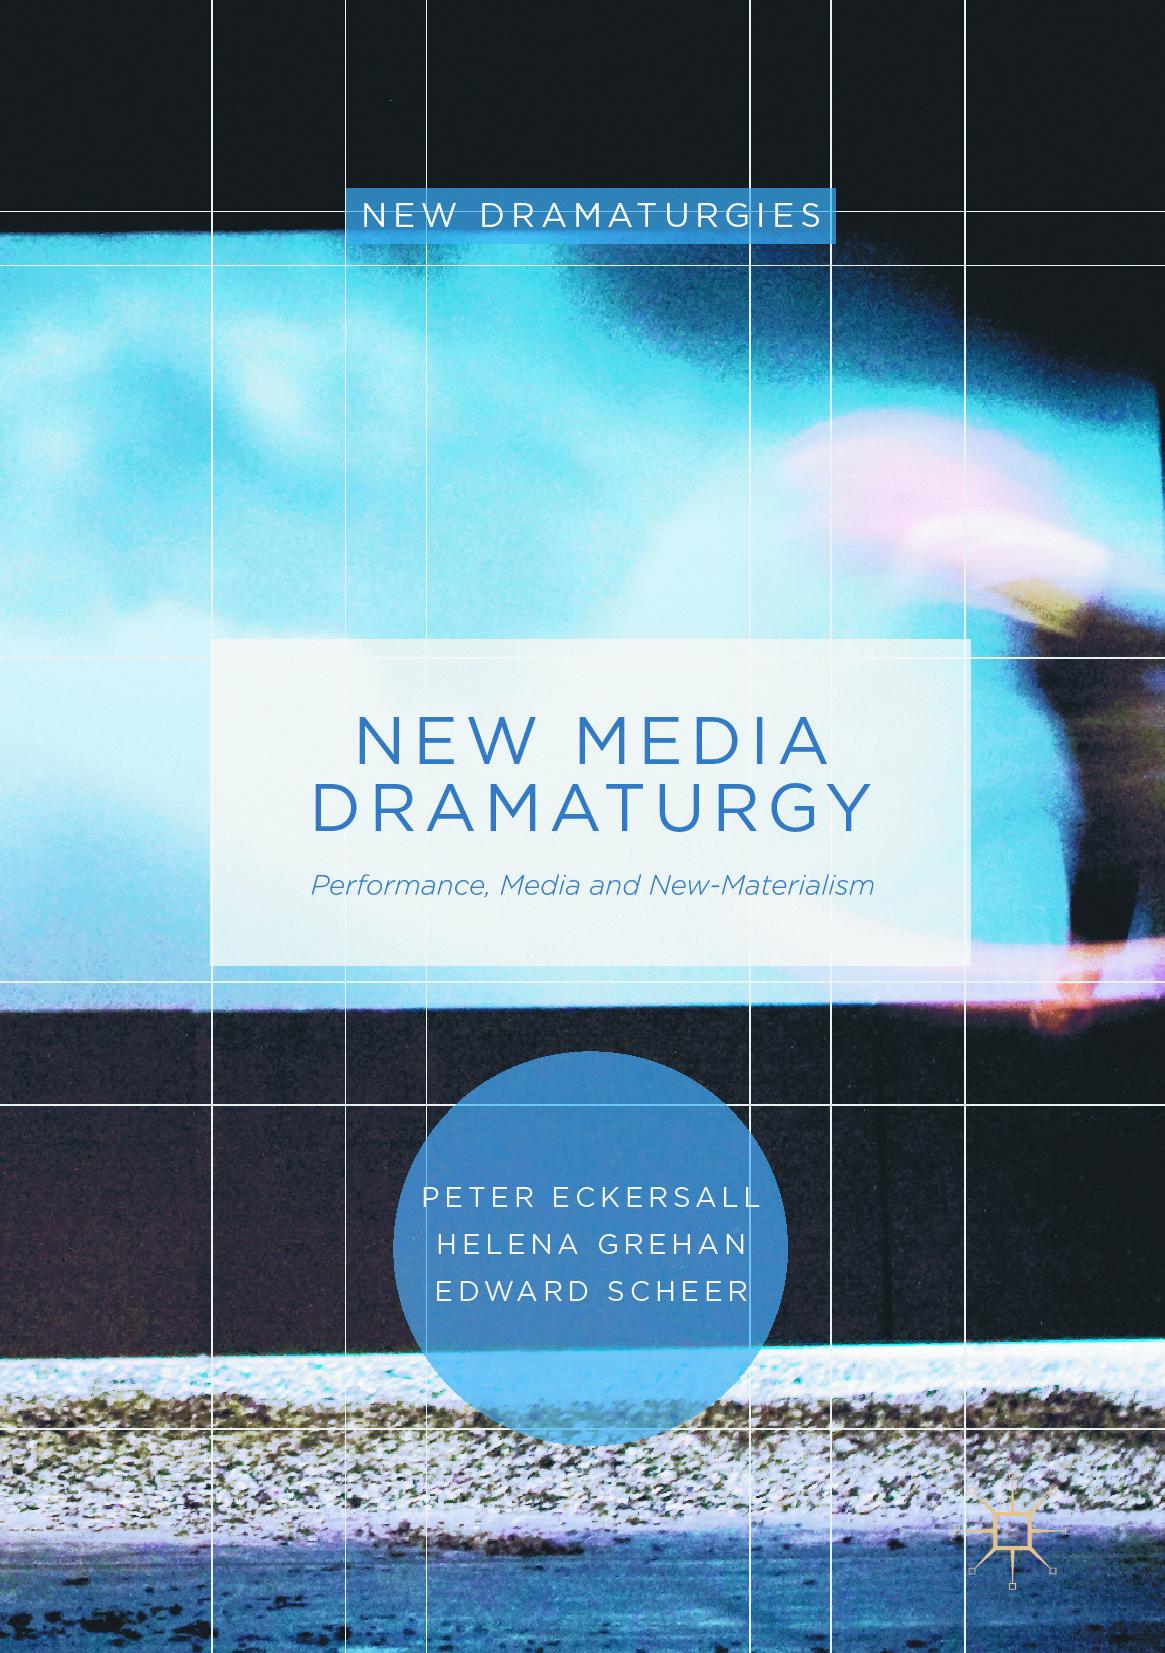 Eckersall, Peter - New Media Dramaturgy, ebook